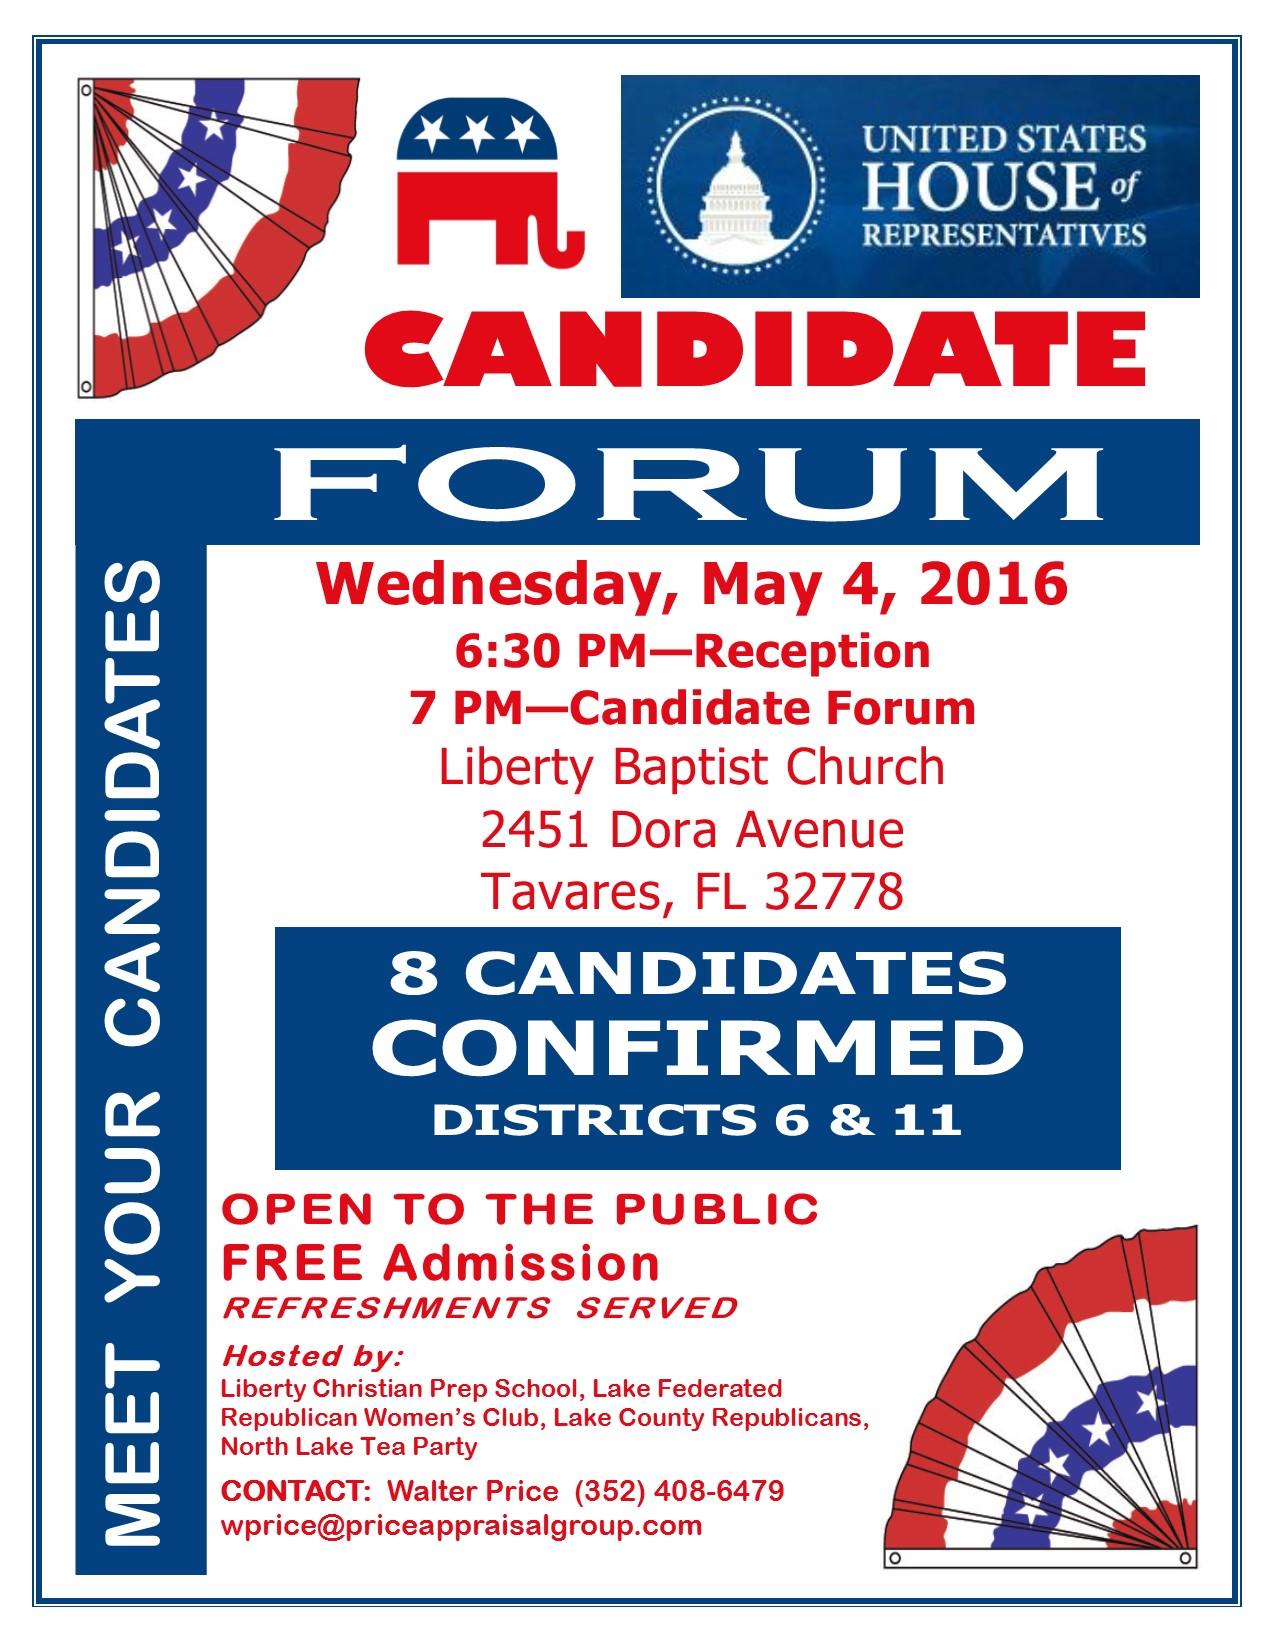 LC_Candidate_Forum_US_Congress_004_20160504.jpg